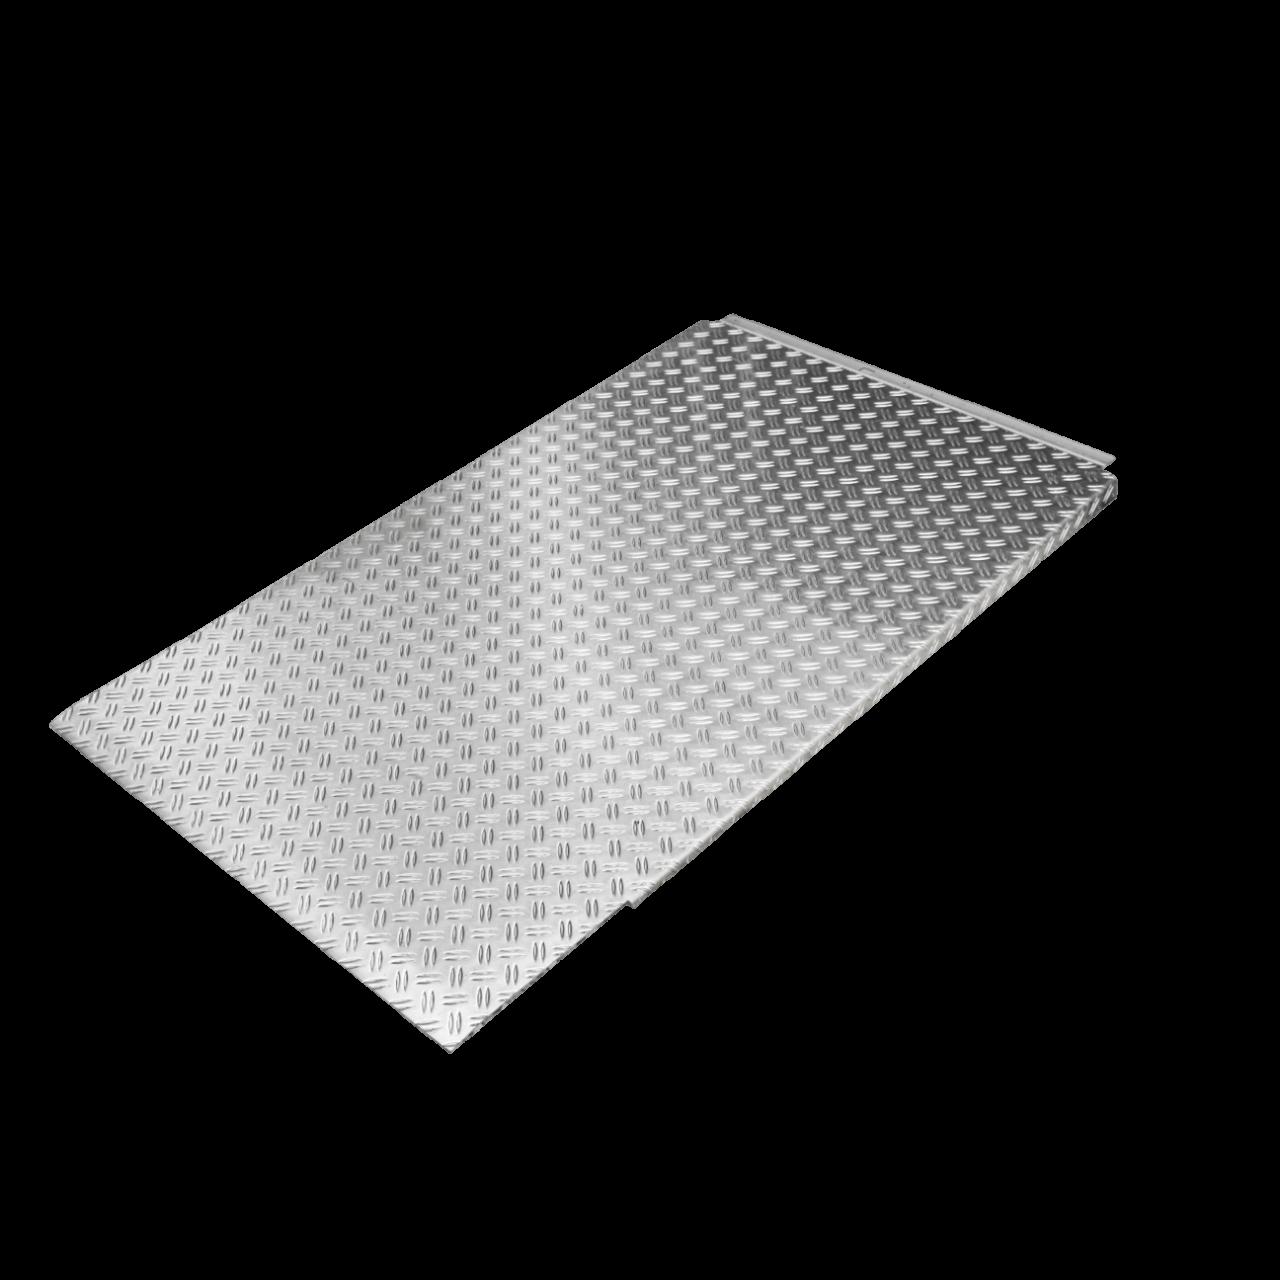 Auffahrrampe, LxB 1460x870mm, Aluminium